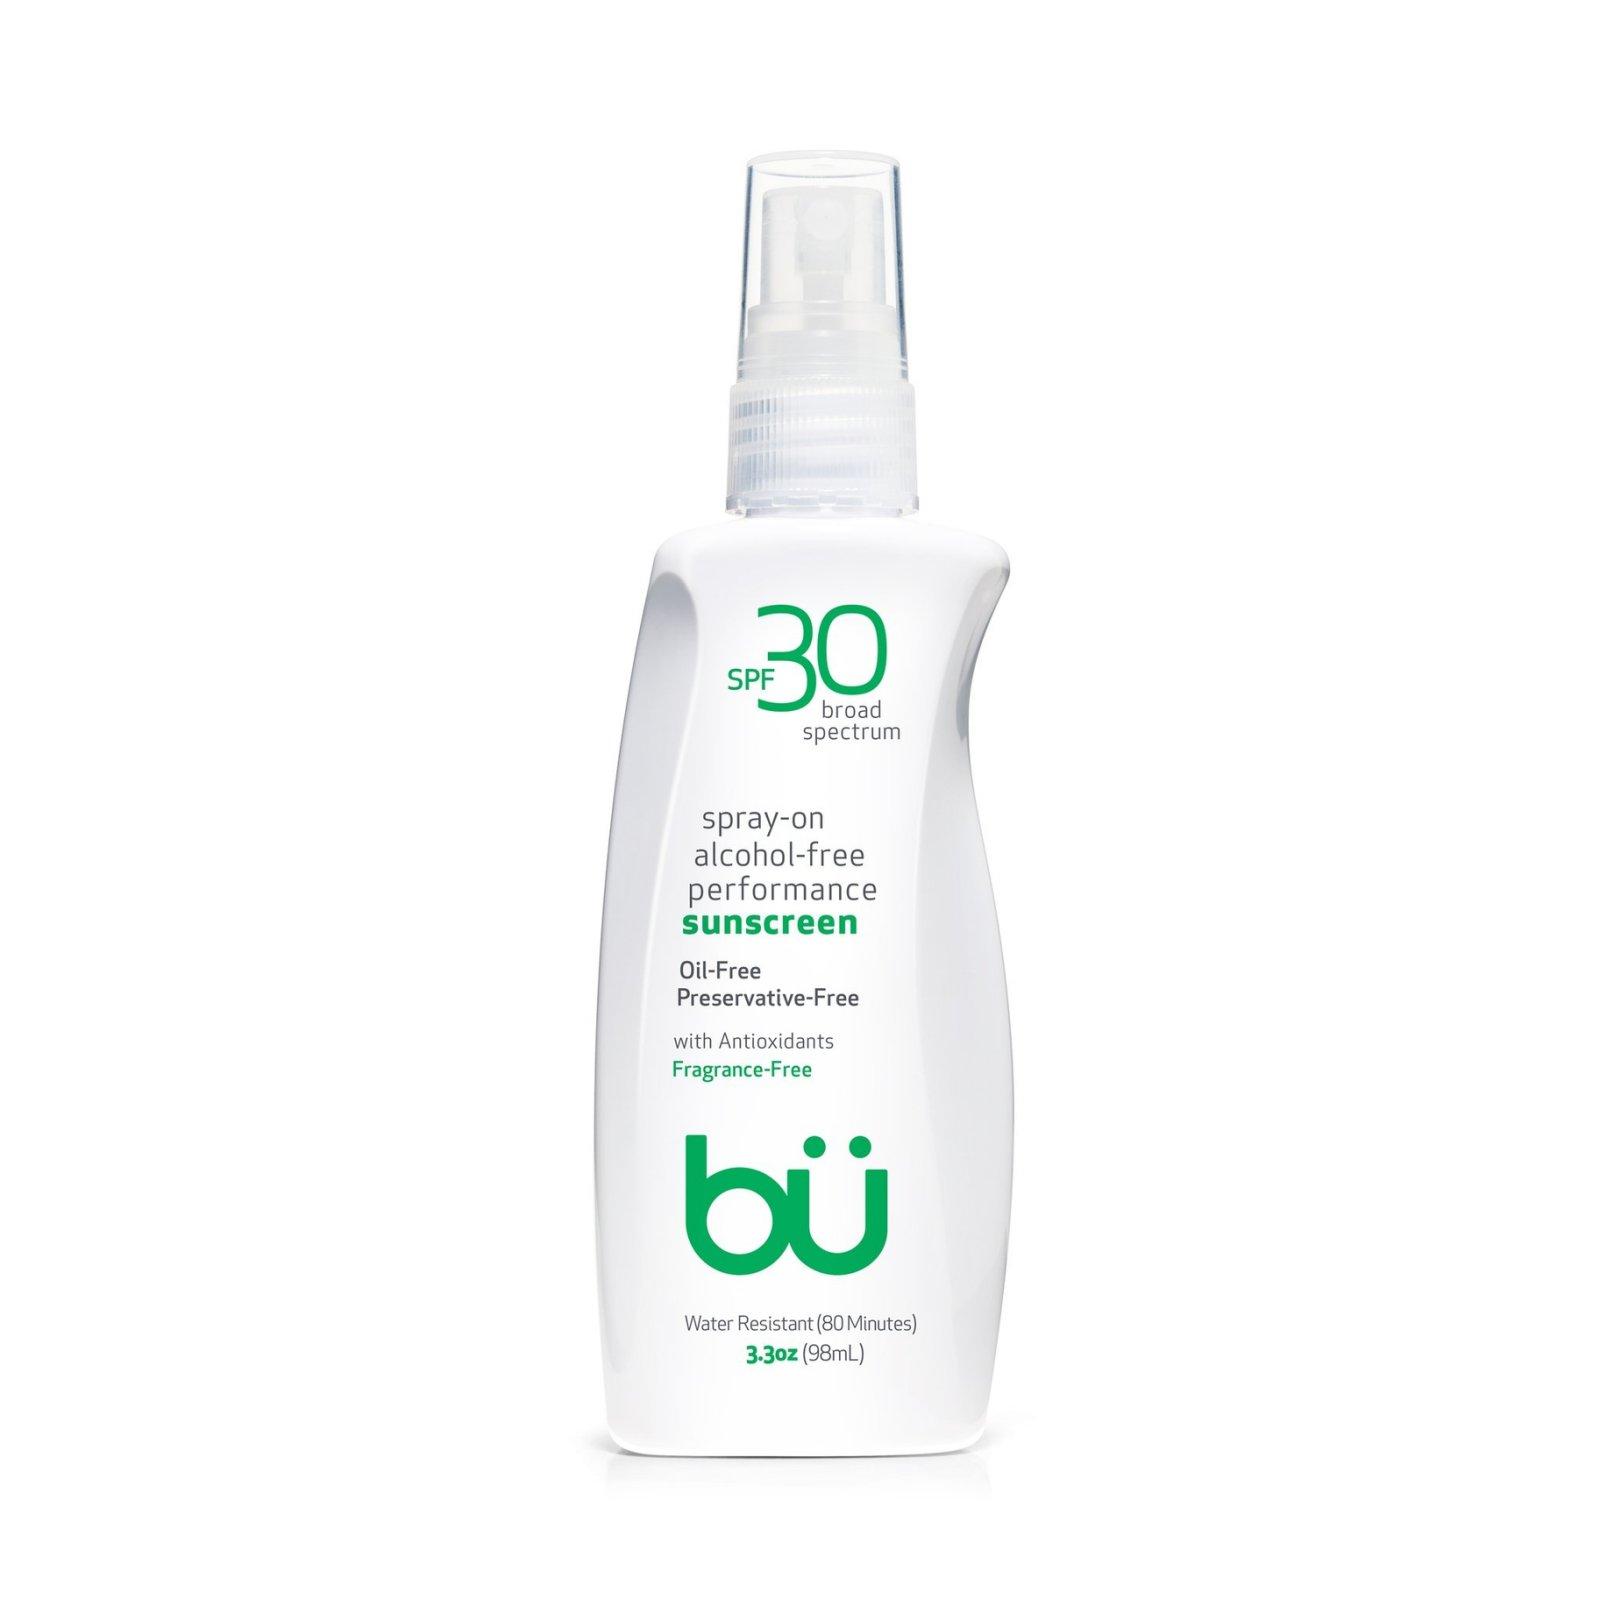 BU Performance Spray Sunscreen SPF 30 Unscented